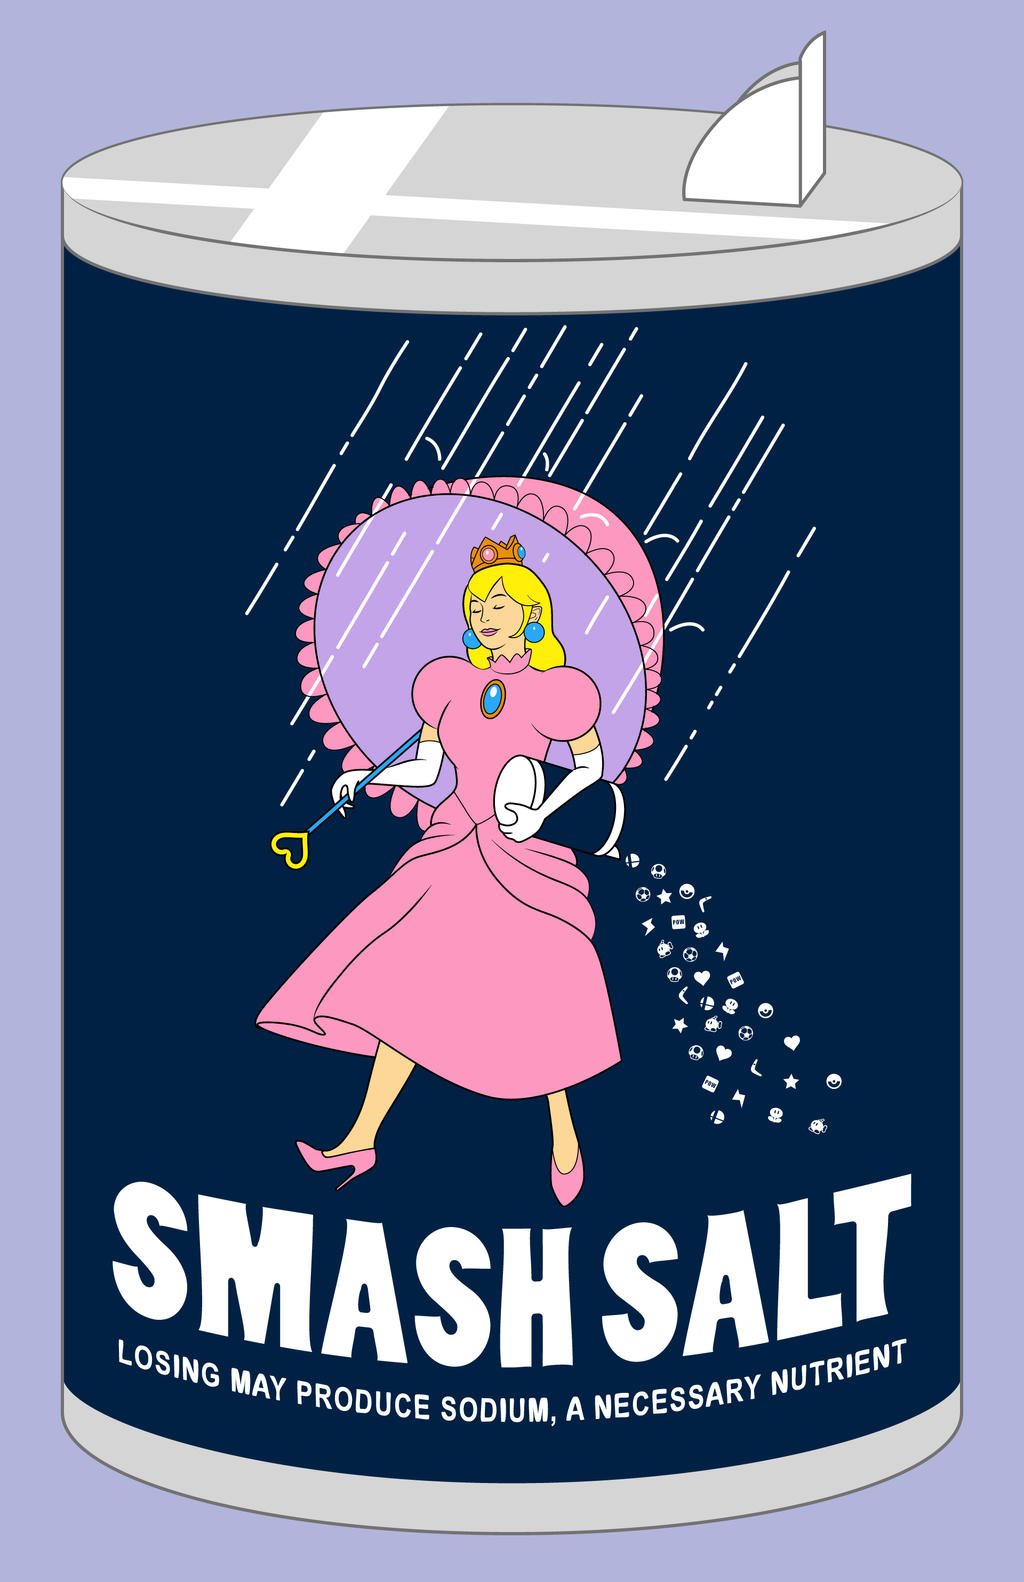 Smash Salt by gavacho13